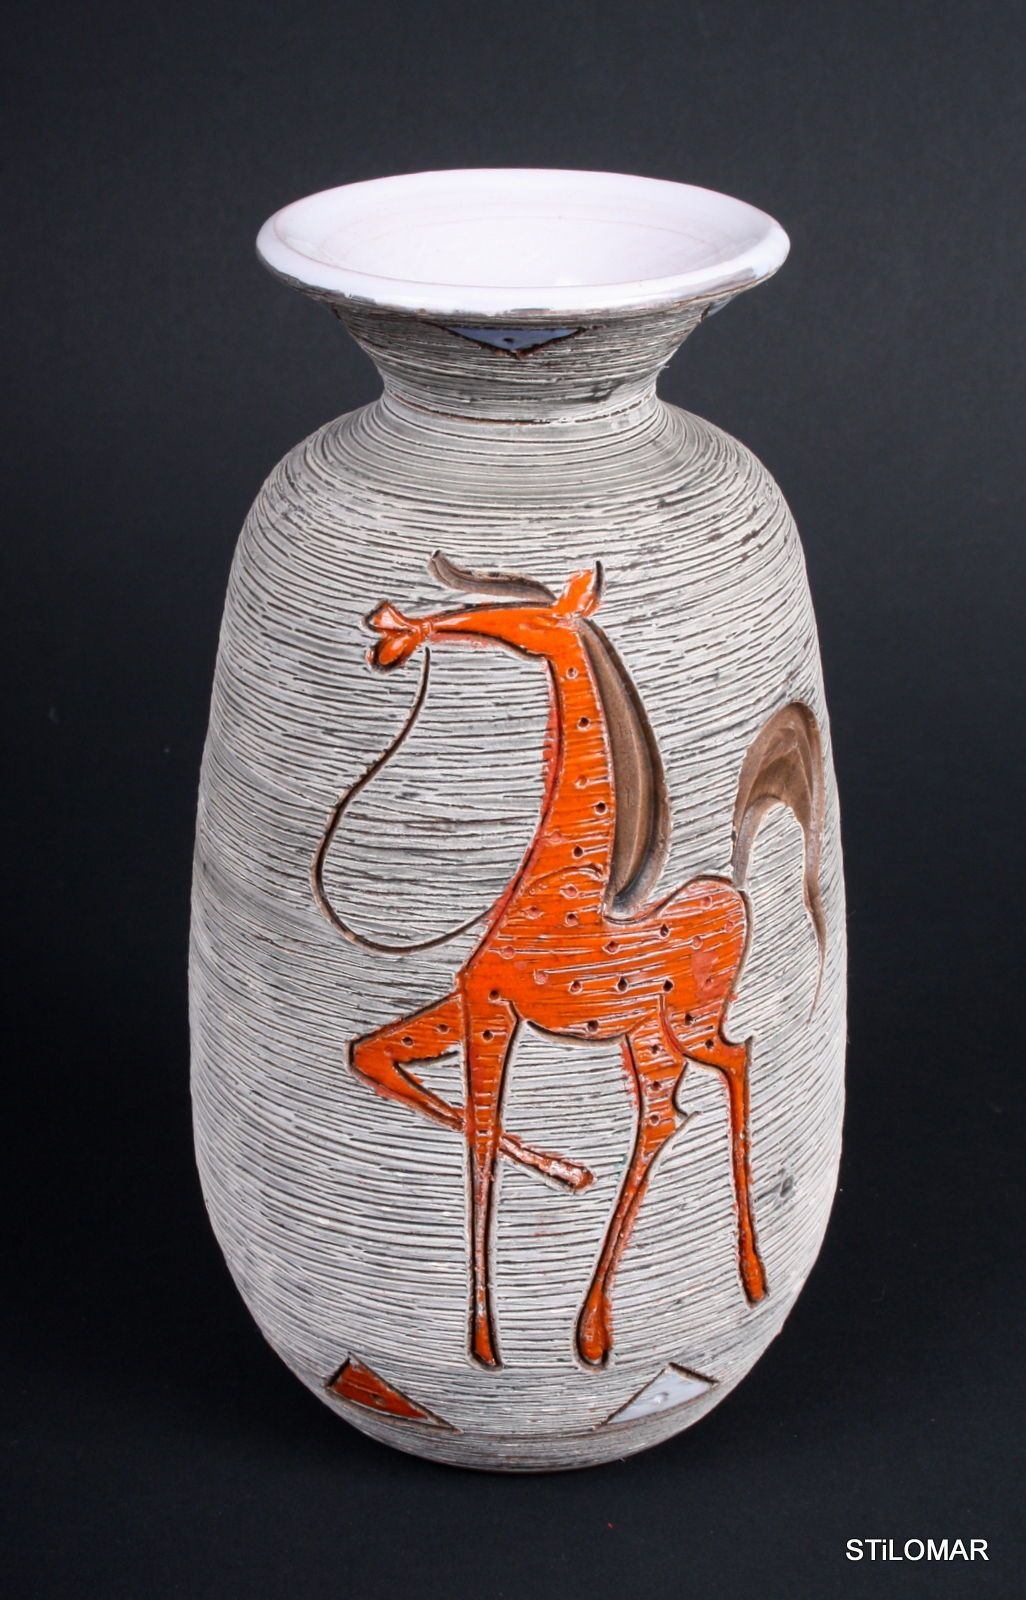 A226 1950s Little Vase Horse Art Pottery Fratelli